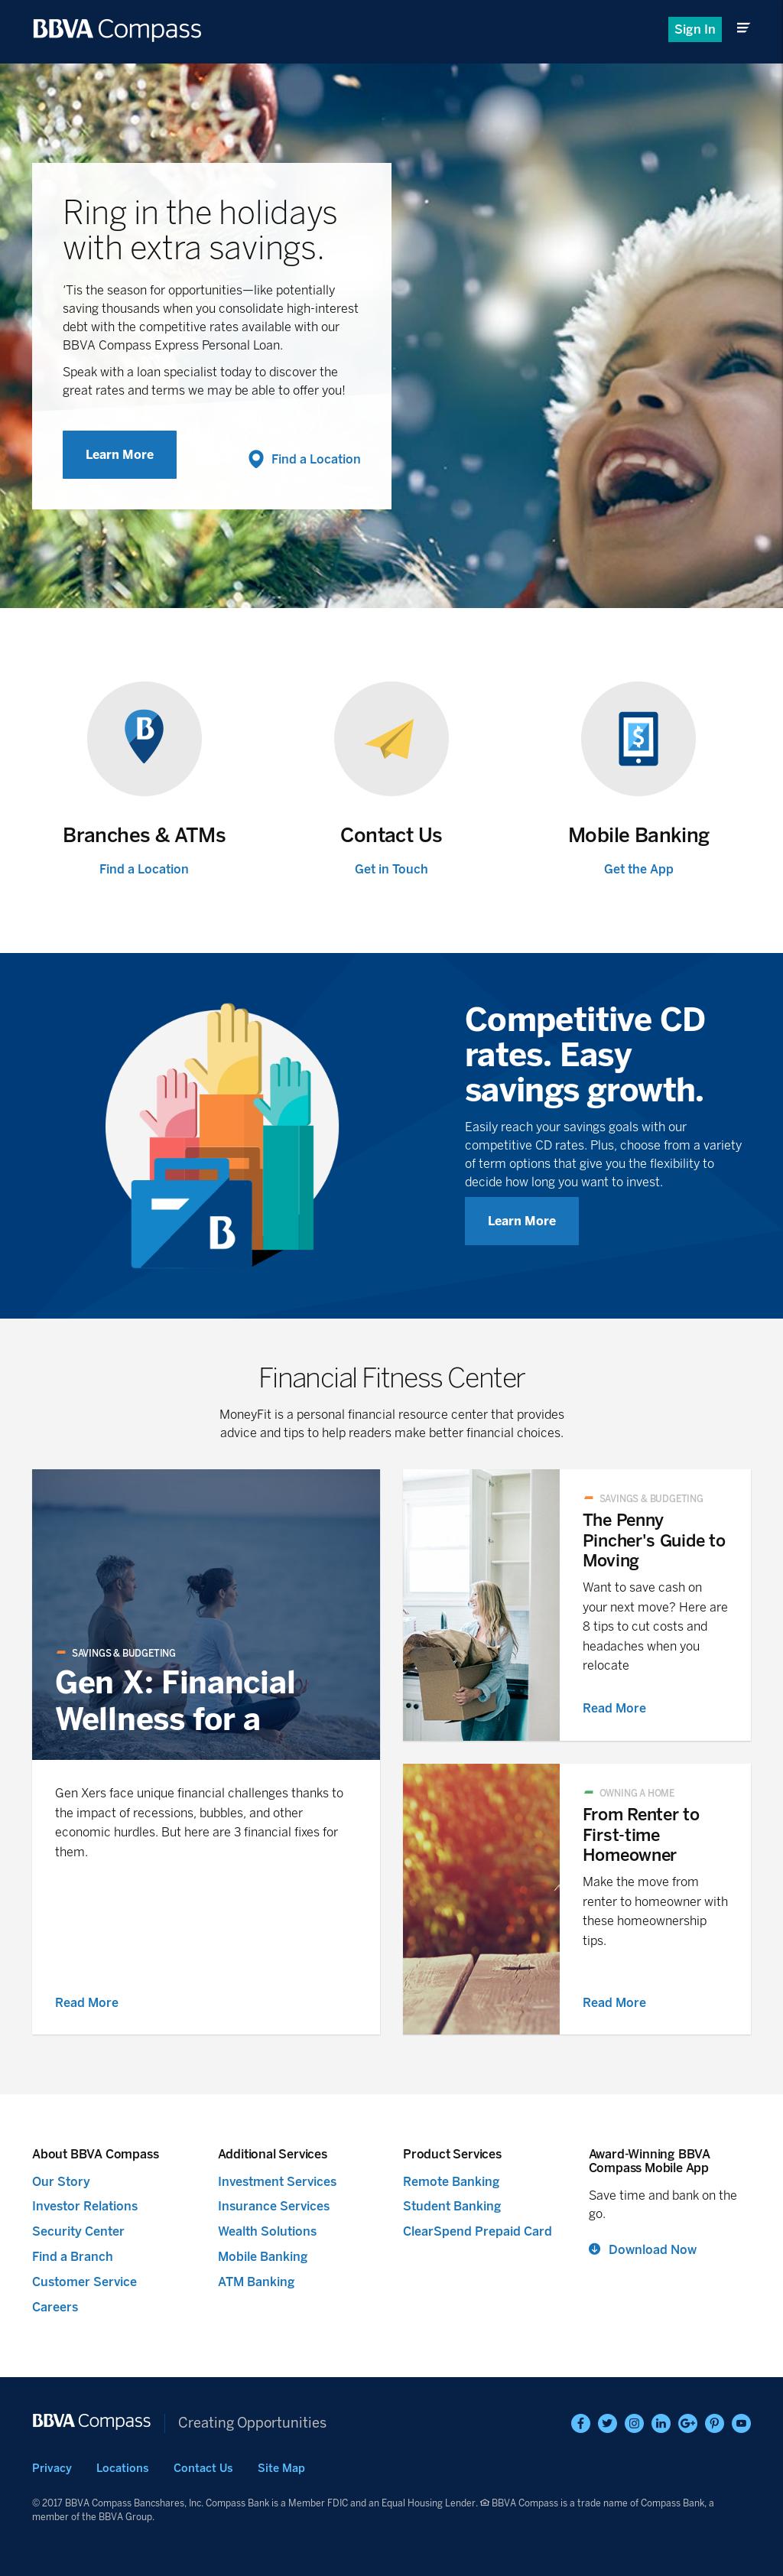 BBVA Compass Competitors, Revenue and Employees - Owler Company Profile